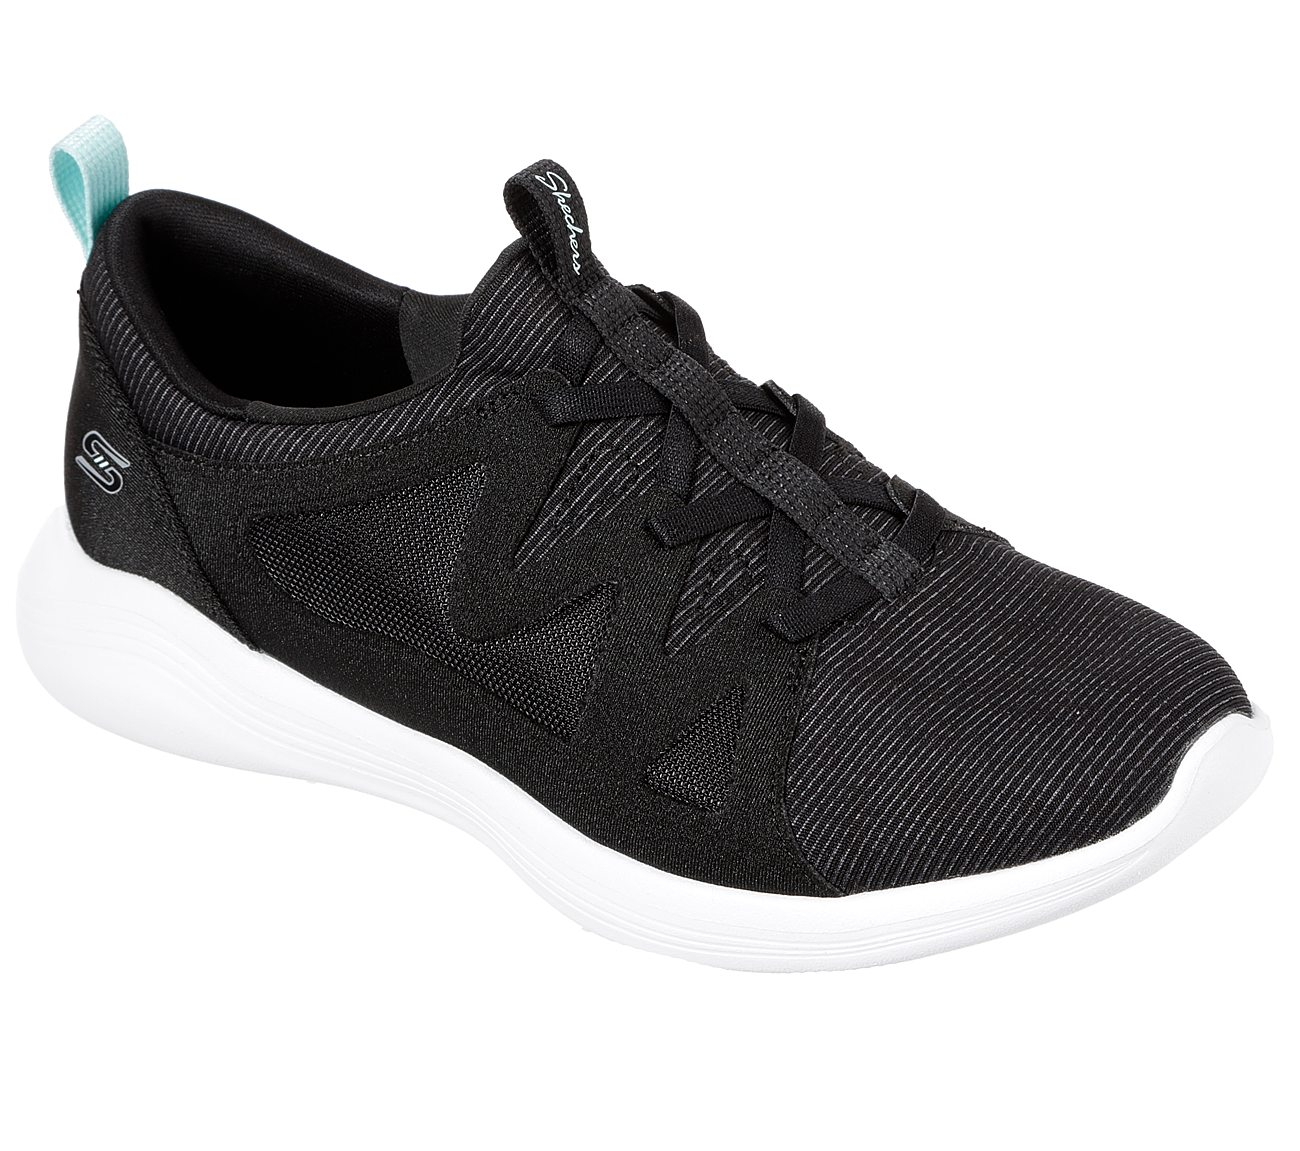 Buy SKECHERS Envy Effortlessly Sport Active Shoes yuHPe